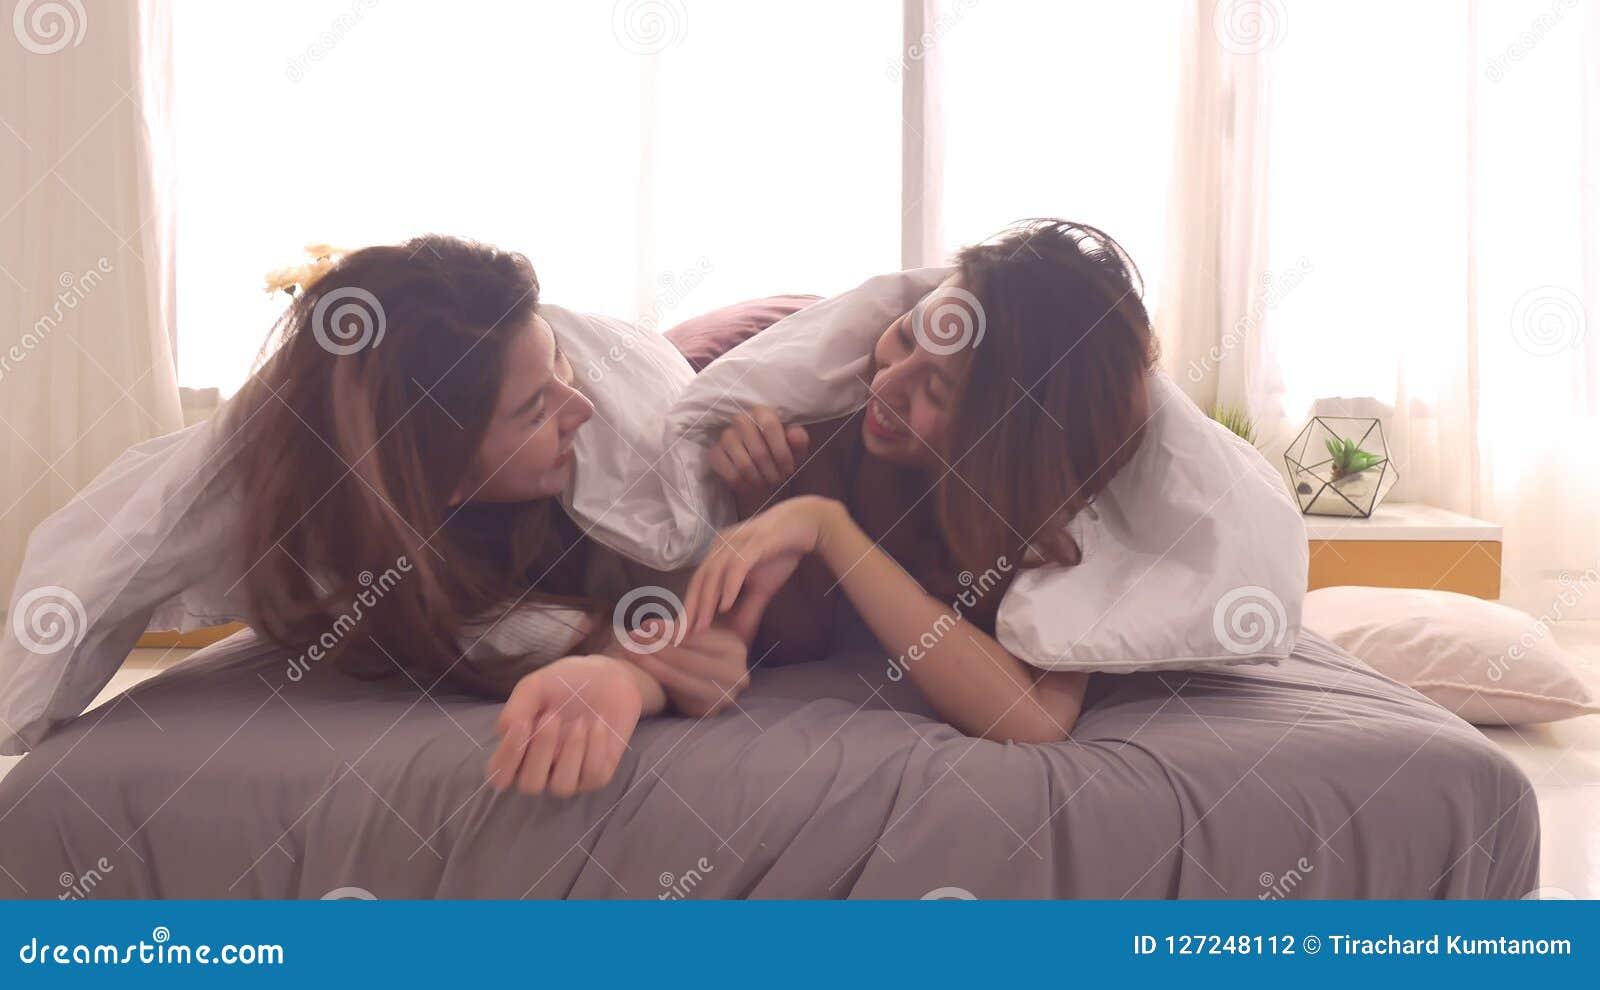 Asian lesbians having